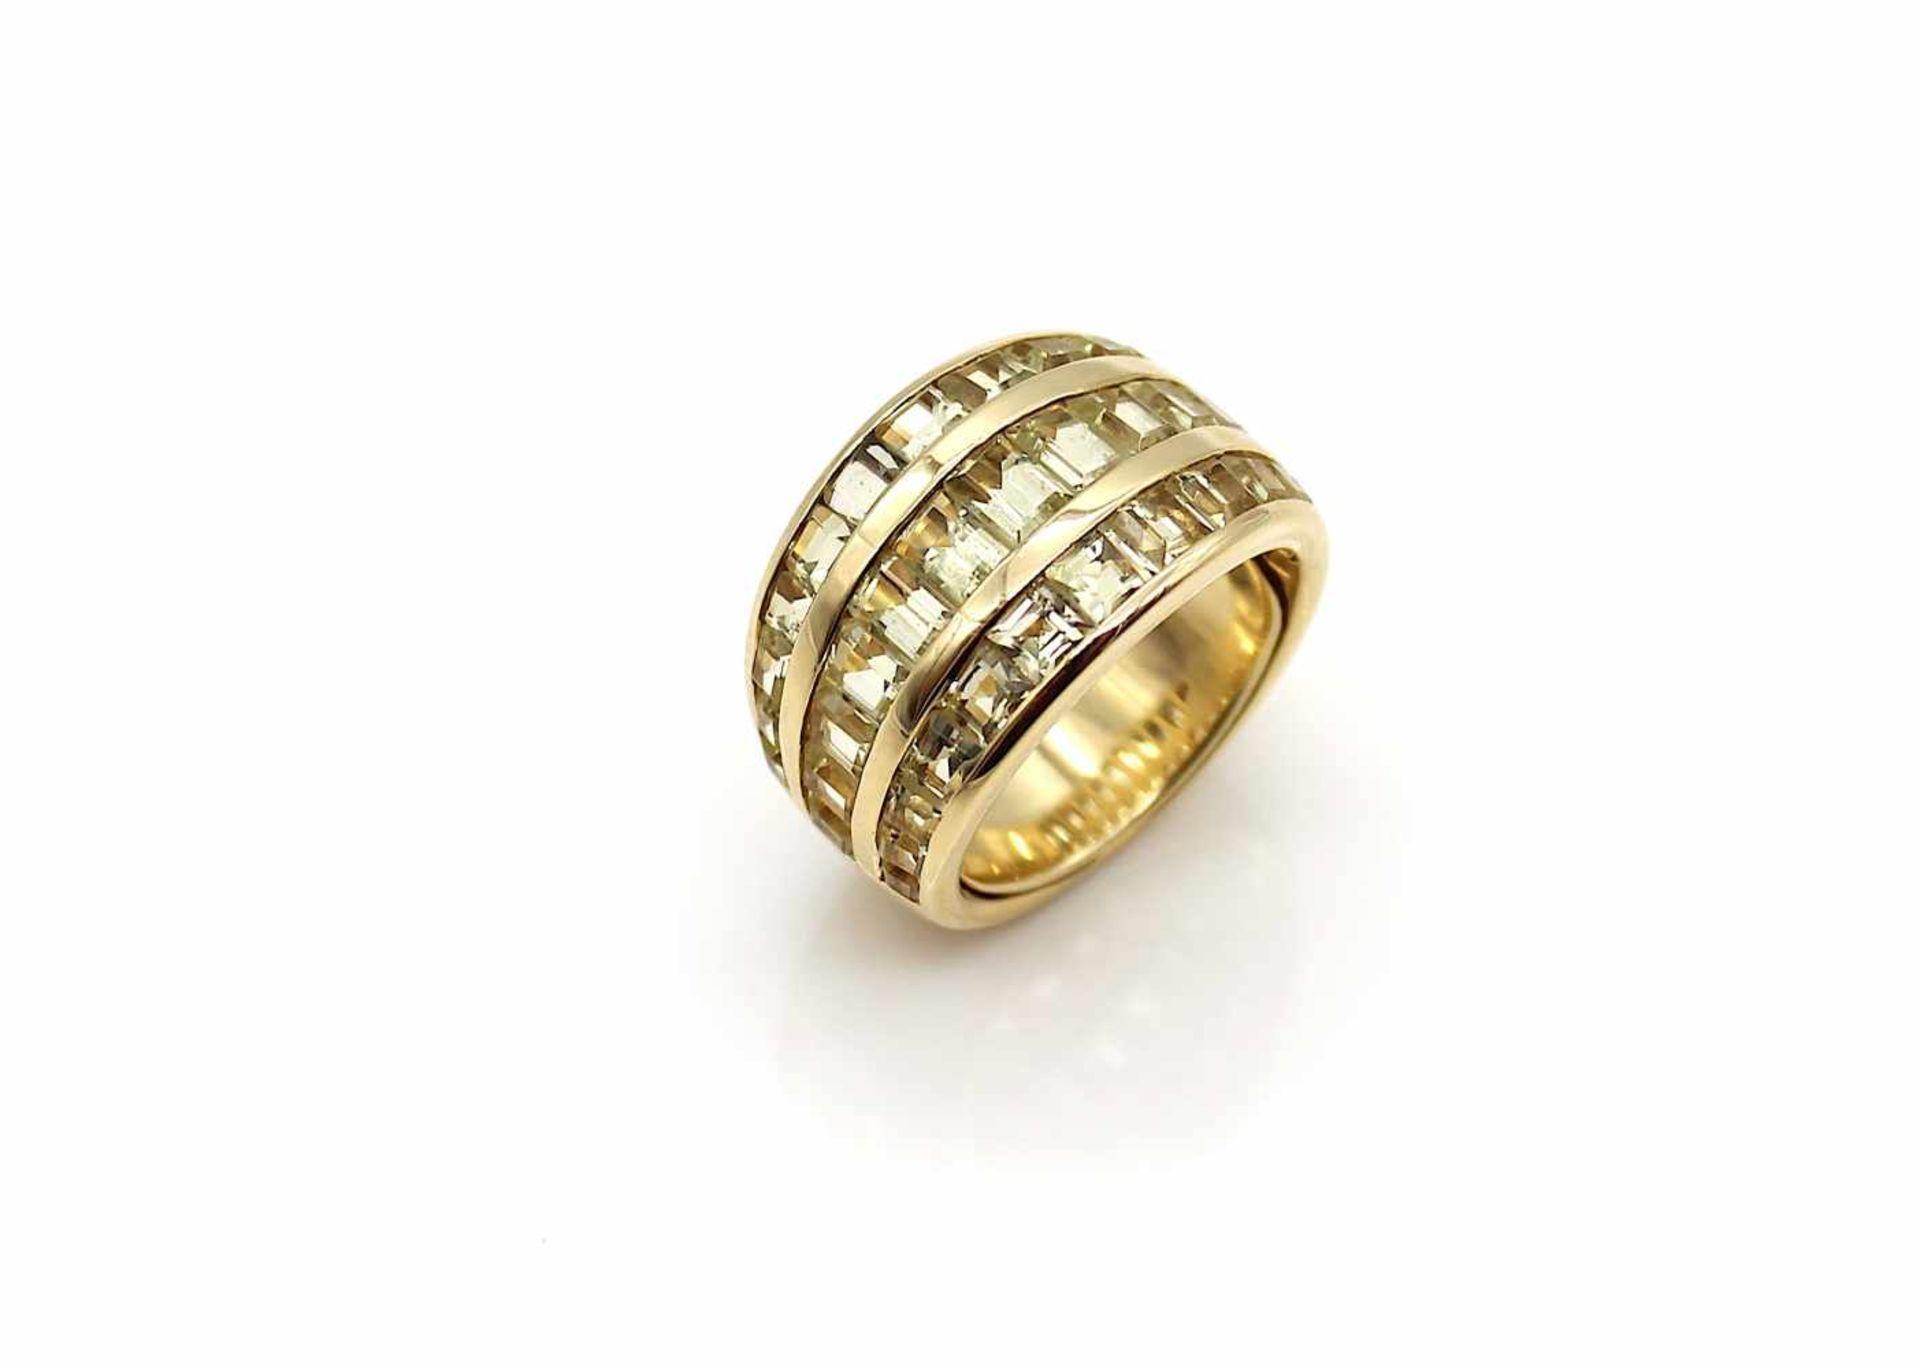 Los 19 - Ring 750 Gold (geprüft) mit div. Citrinen, 15,2 g, Gr. 52